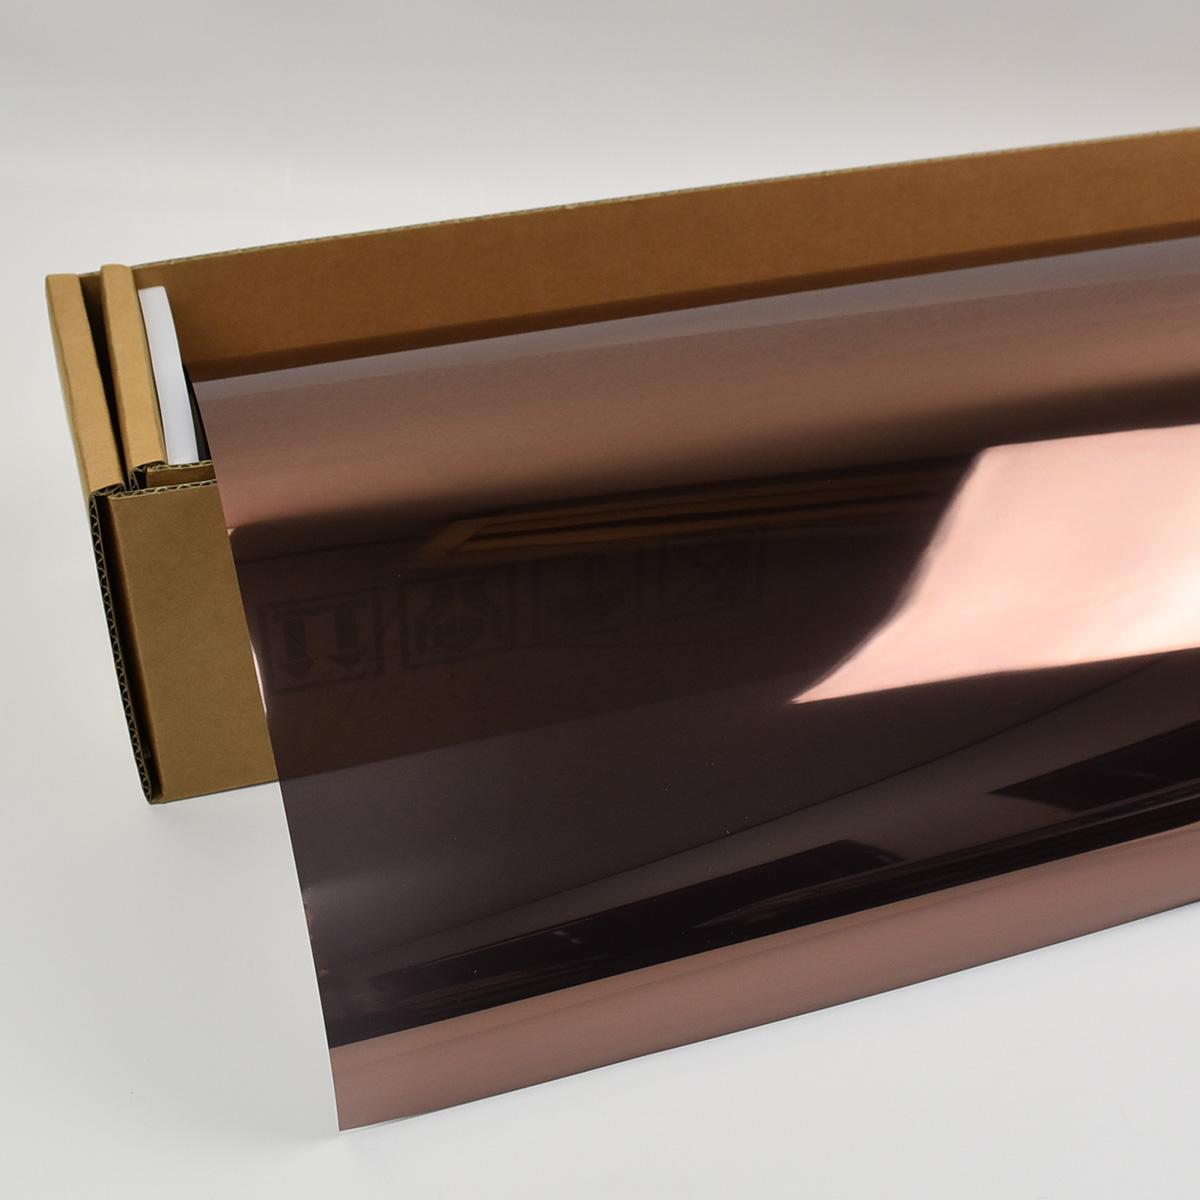 <title>HPブロンズメタル10 10% 奉呈 50cm幅x30mロール箱売 #HP10BR20 Roll#</title>